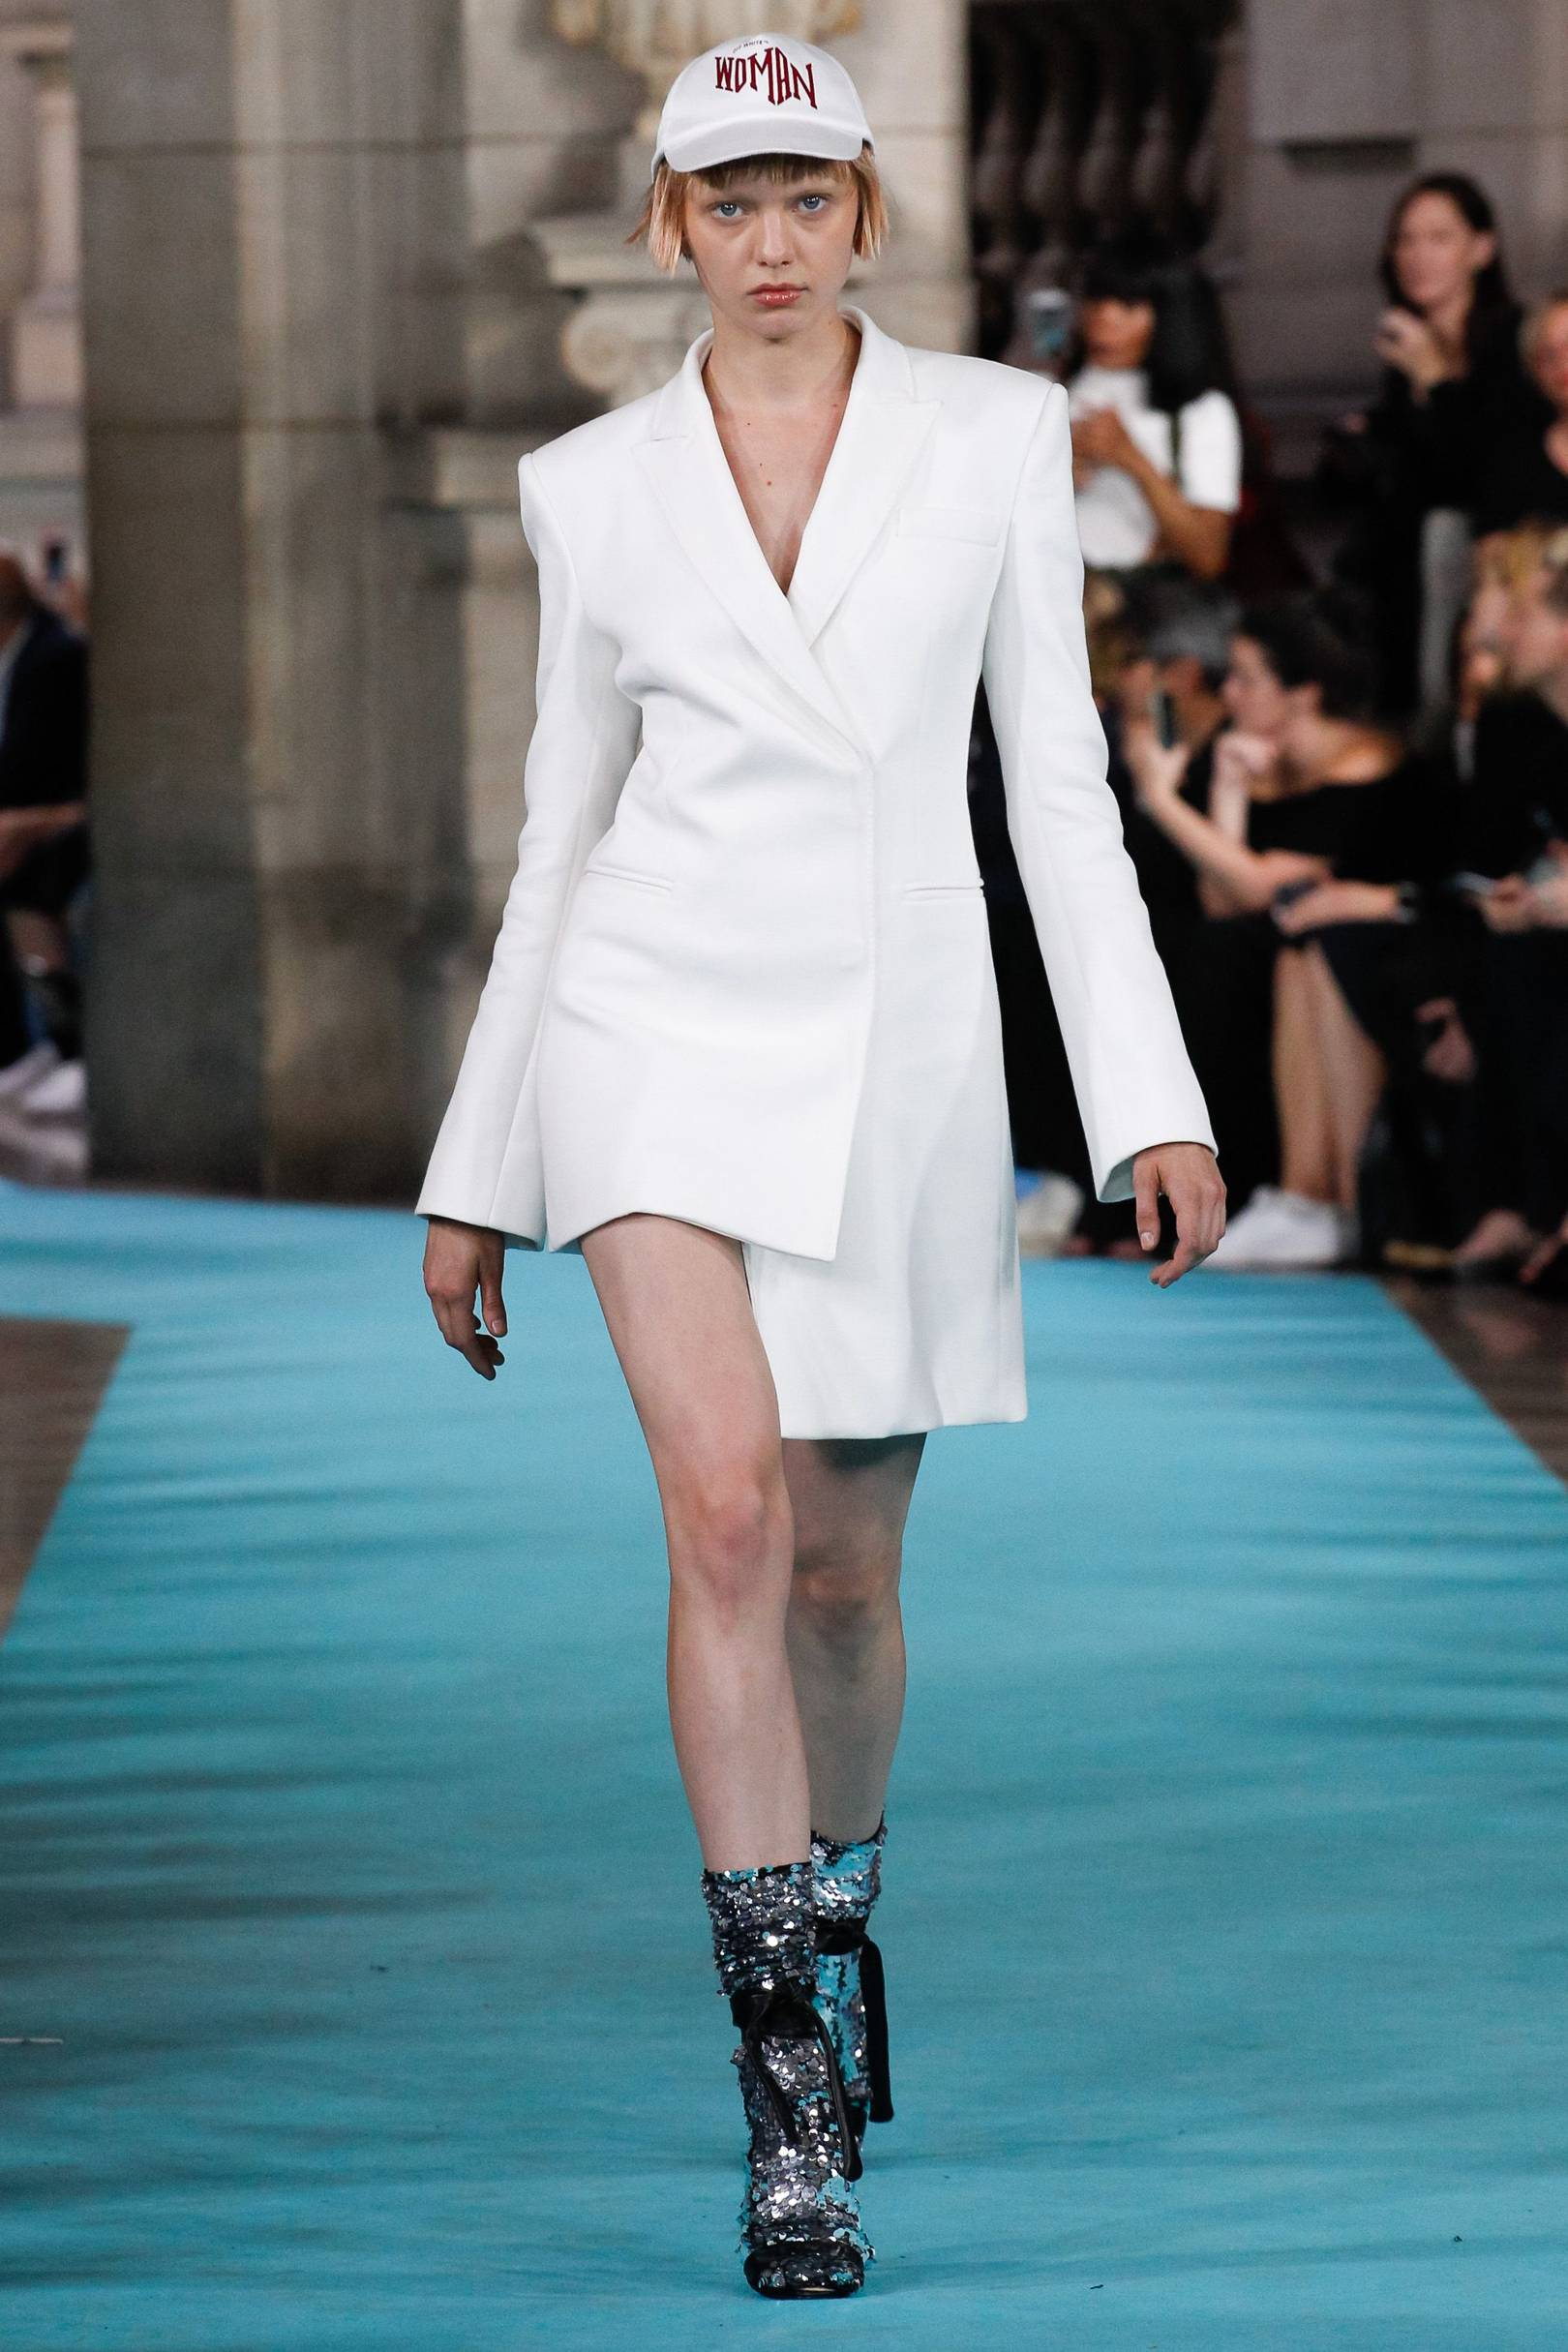 Kendall Jenner 21st Birthday Party Dress Inspiration | British Vogue